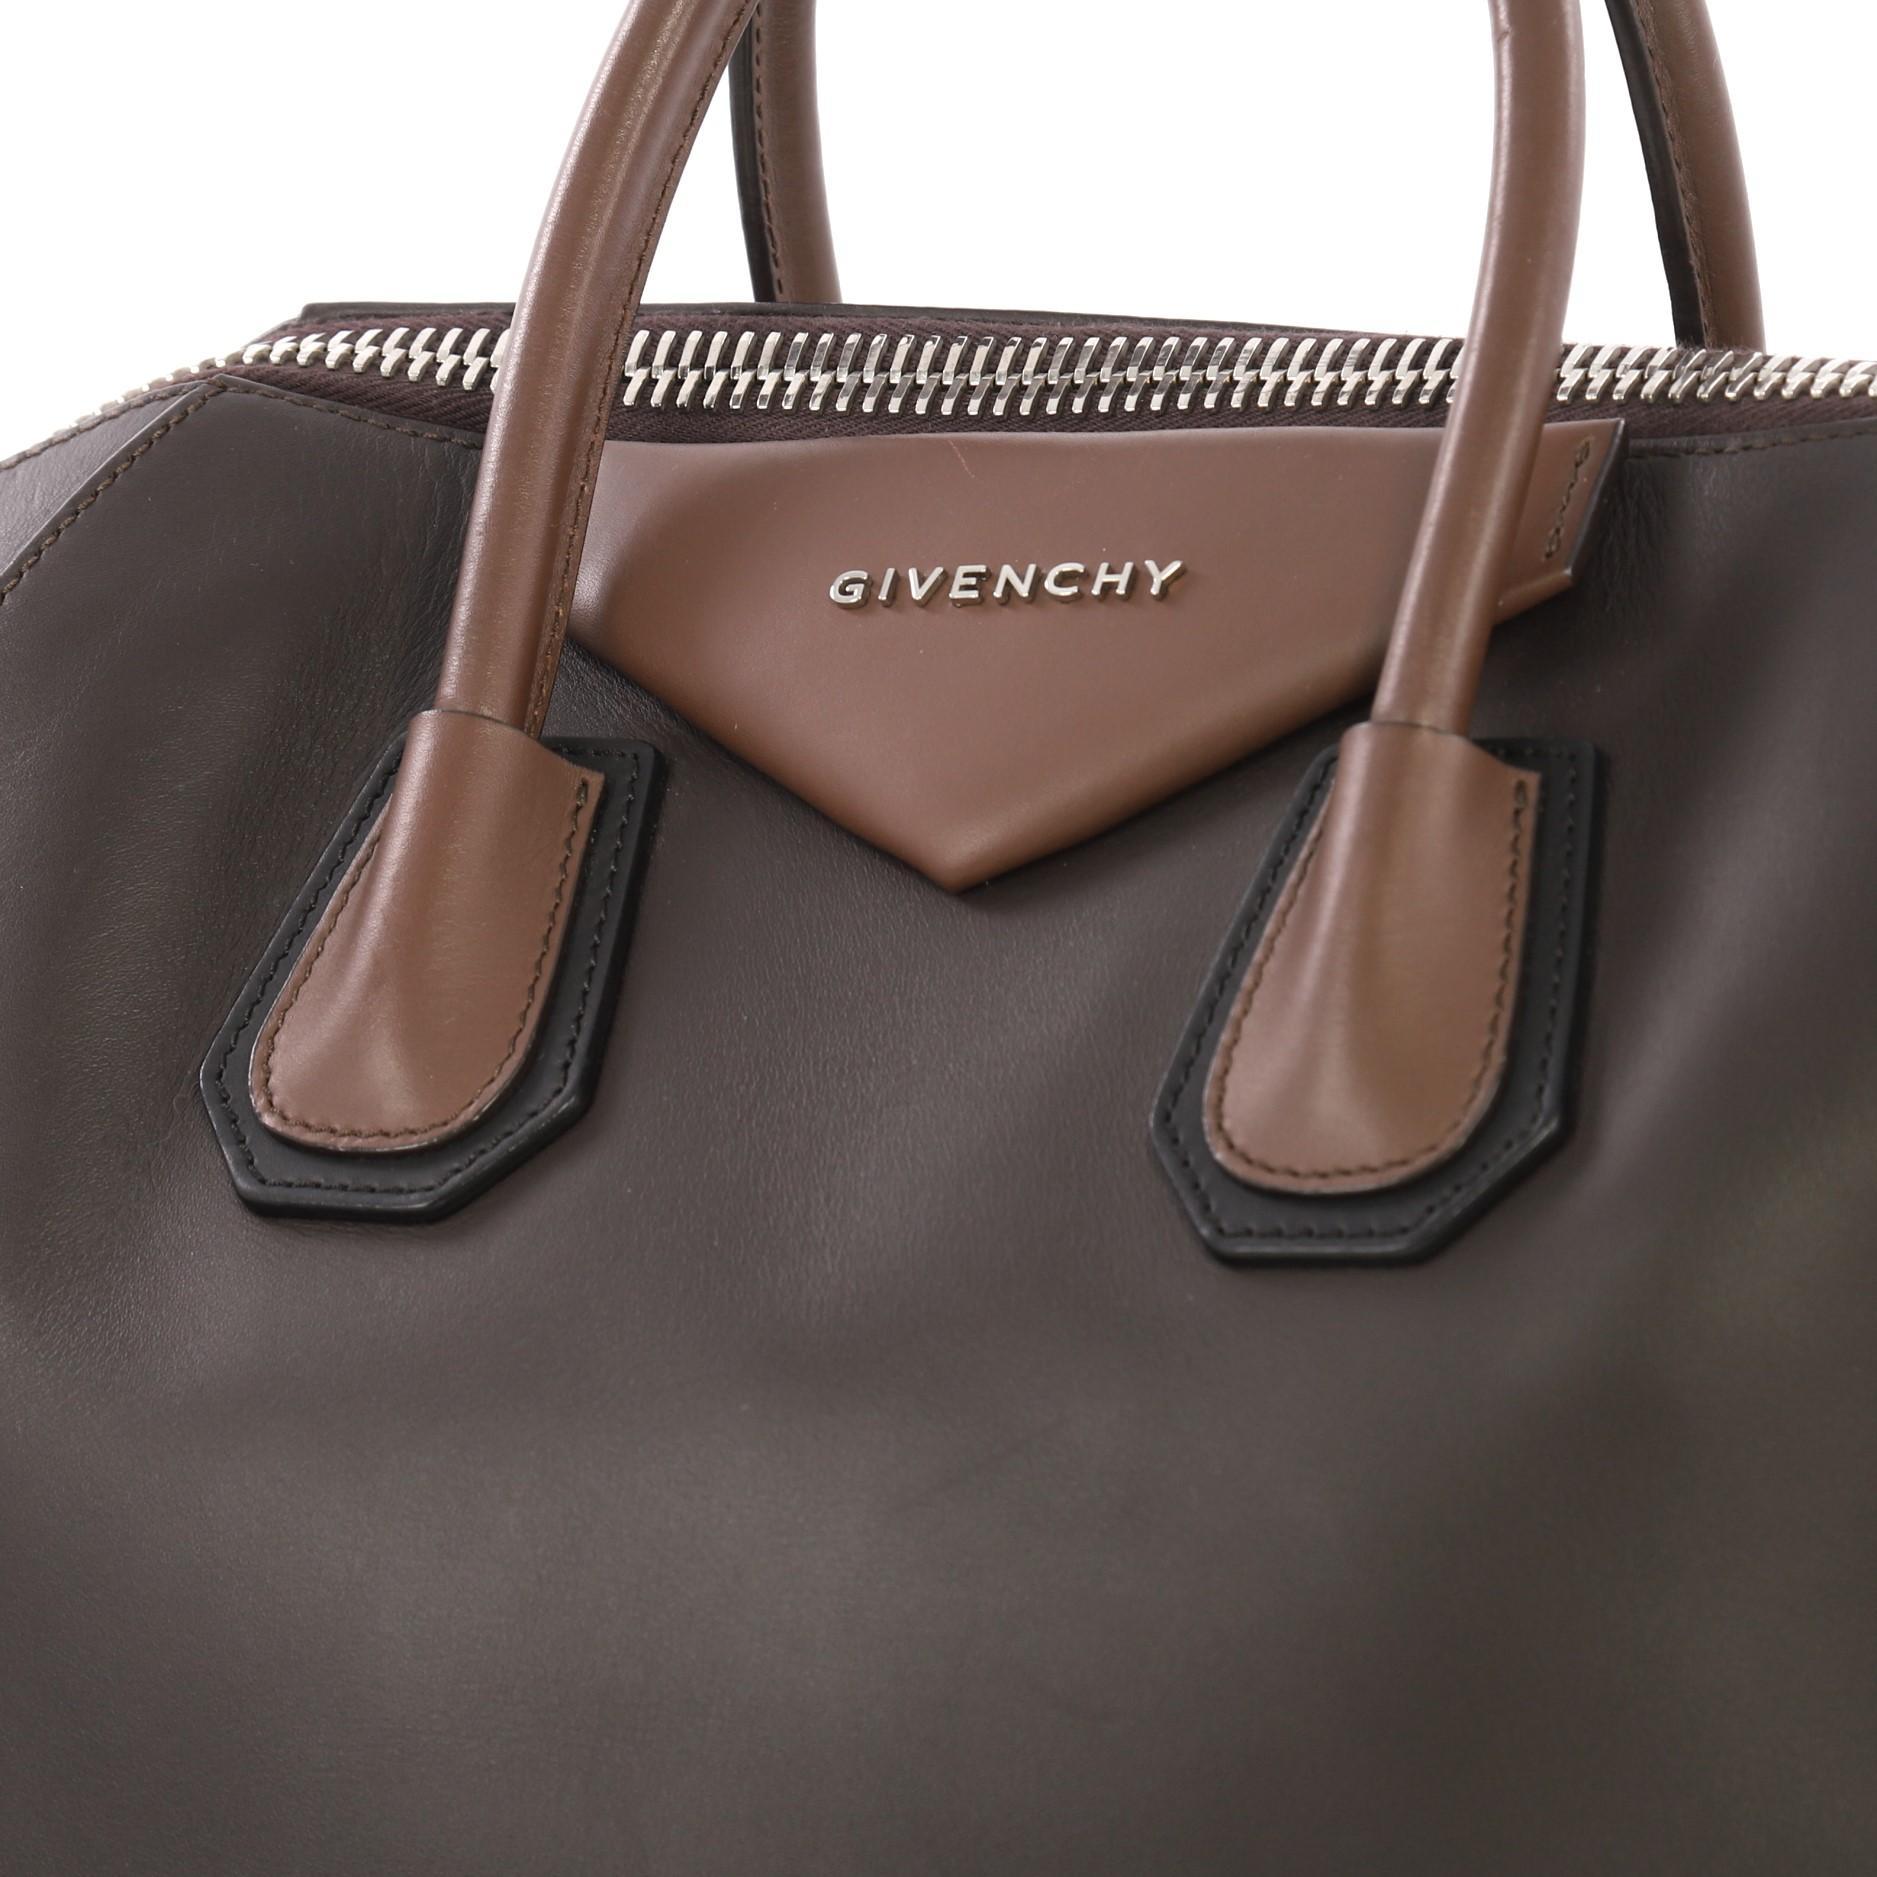 b0b6a3044 Givenchy Bicolor Antigona Bag Leather Medium at 1stdibs